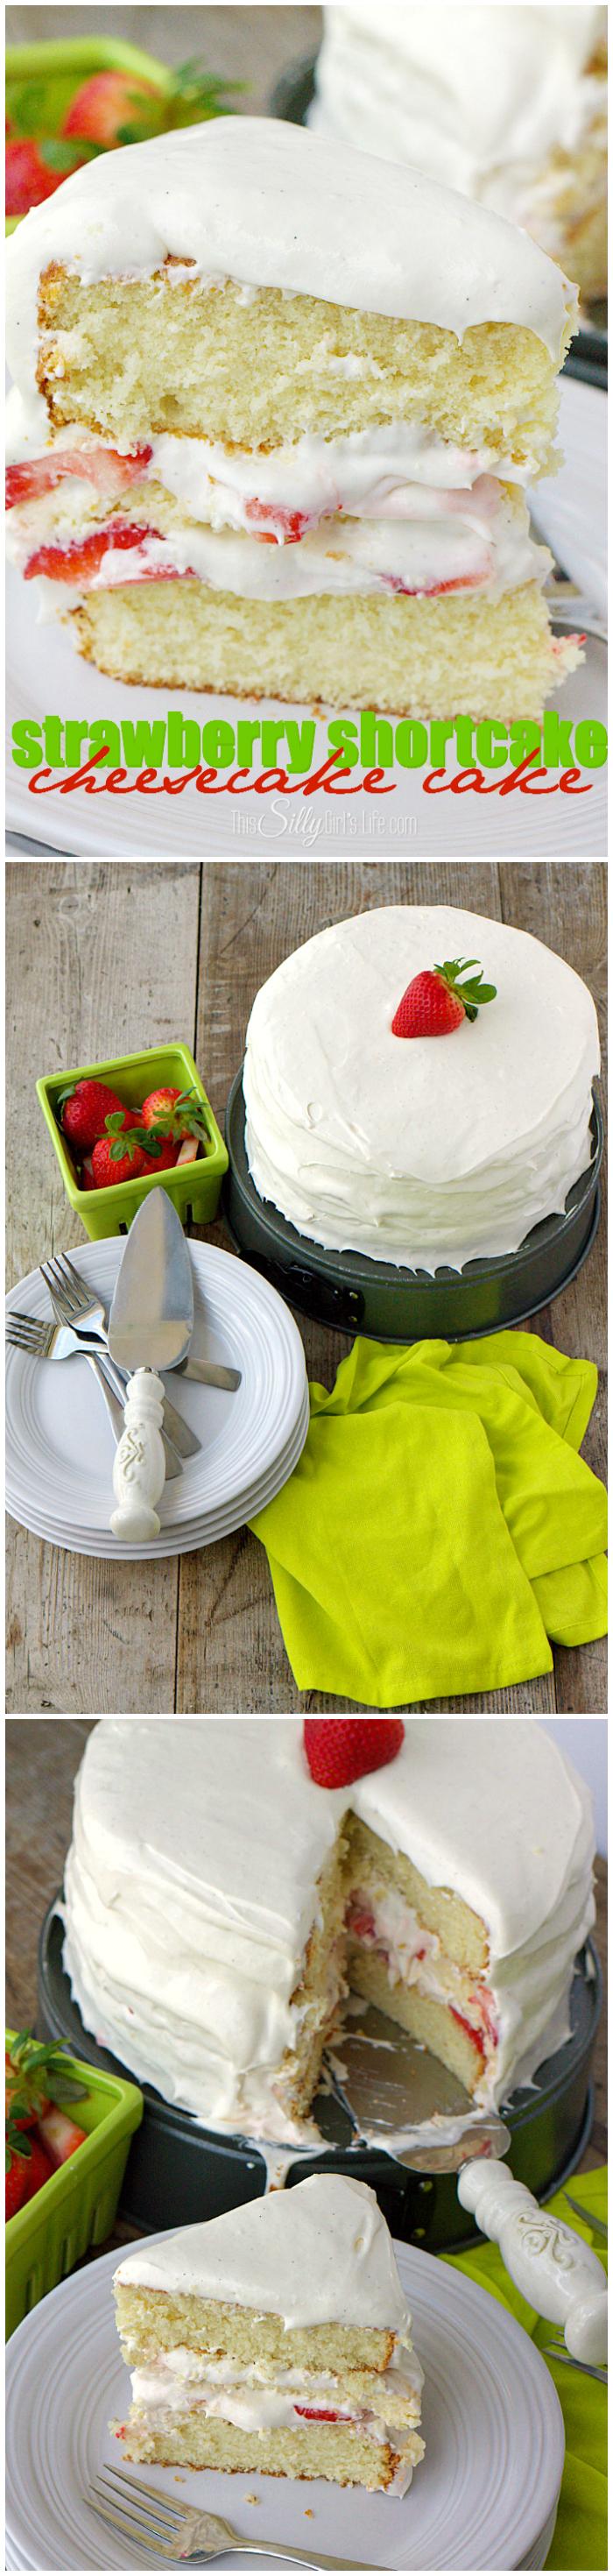 strawberry shortcake cheesecake cake collage